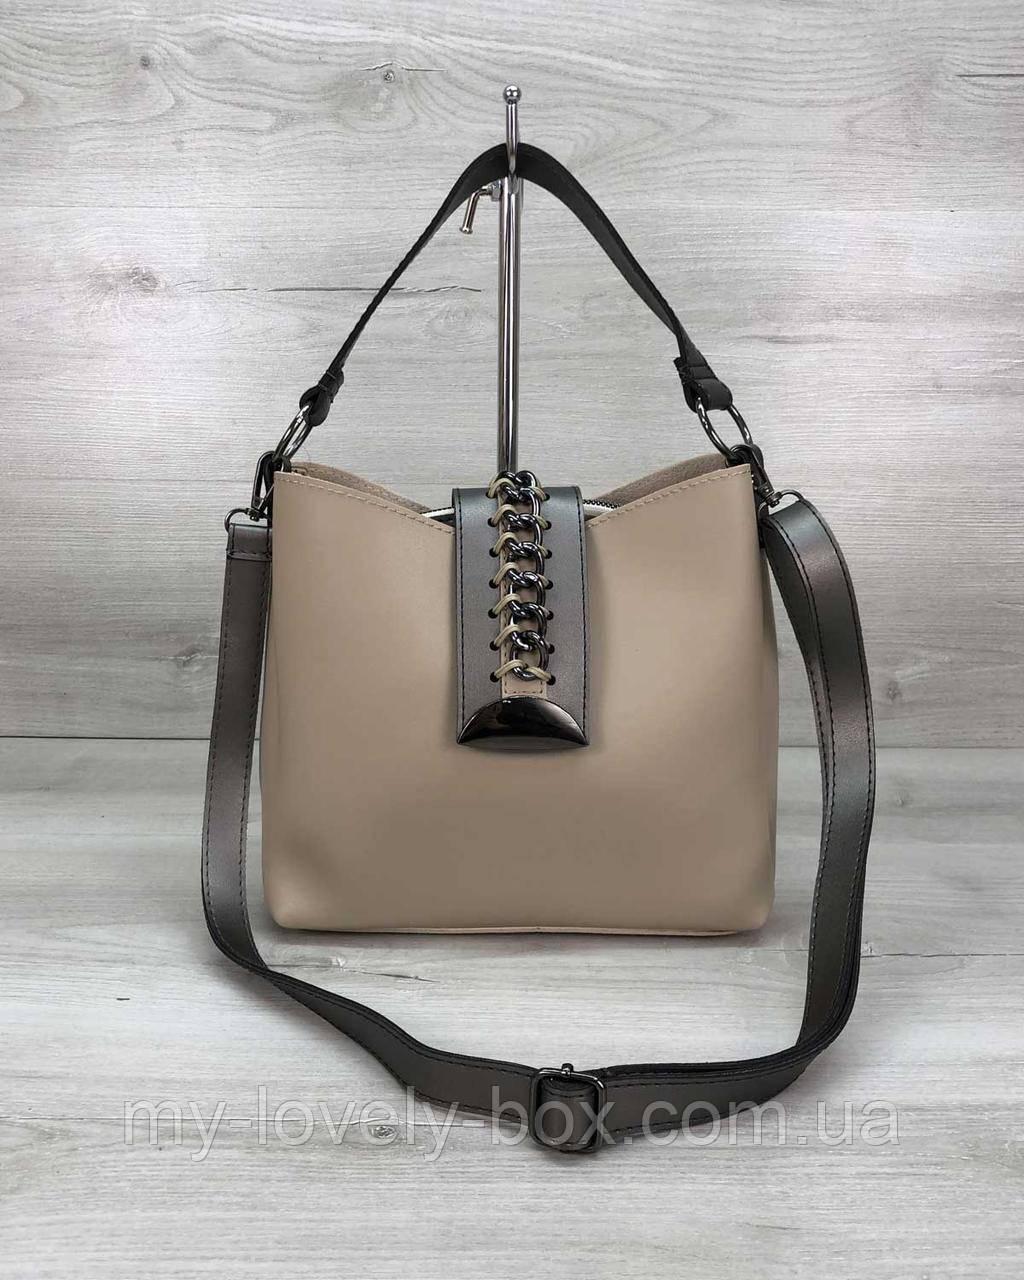 Жіноча сумка «Саті» бежева